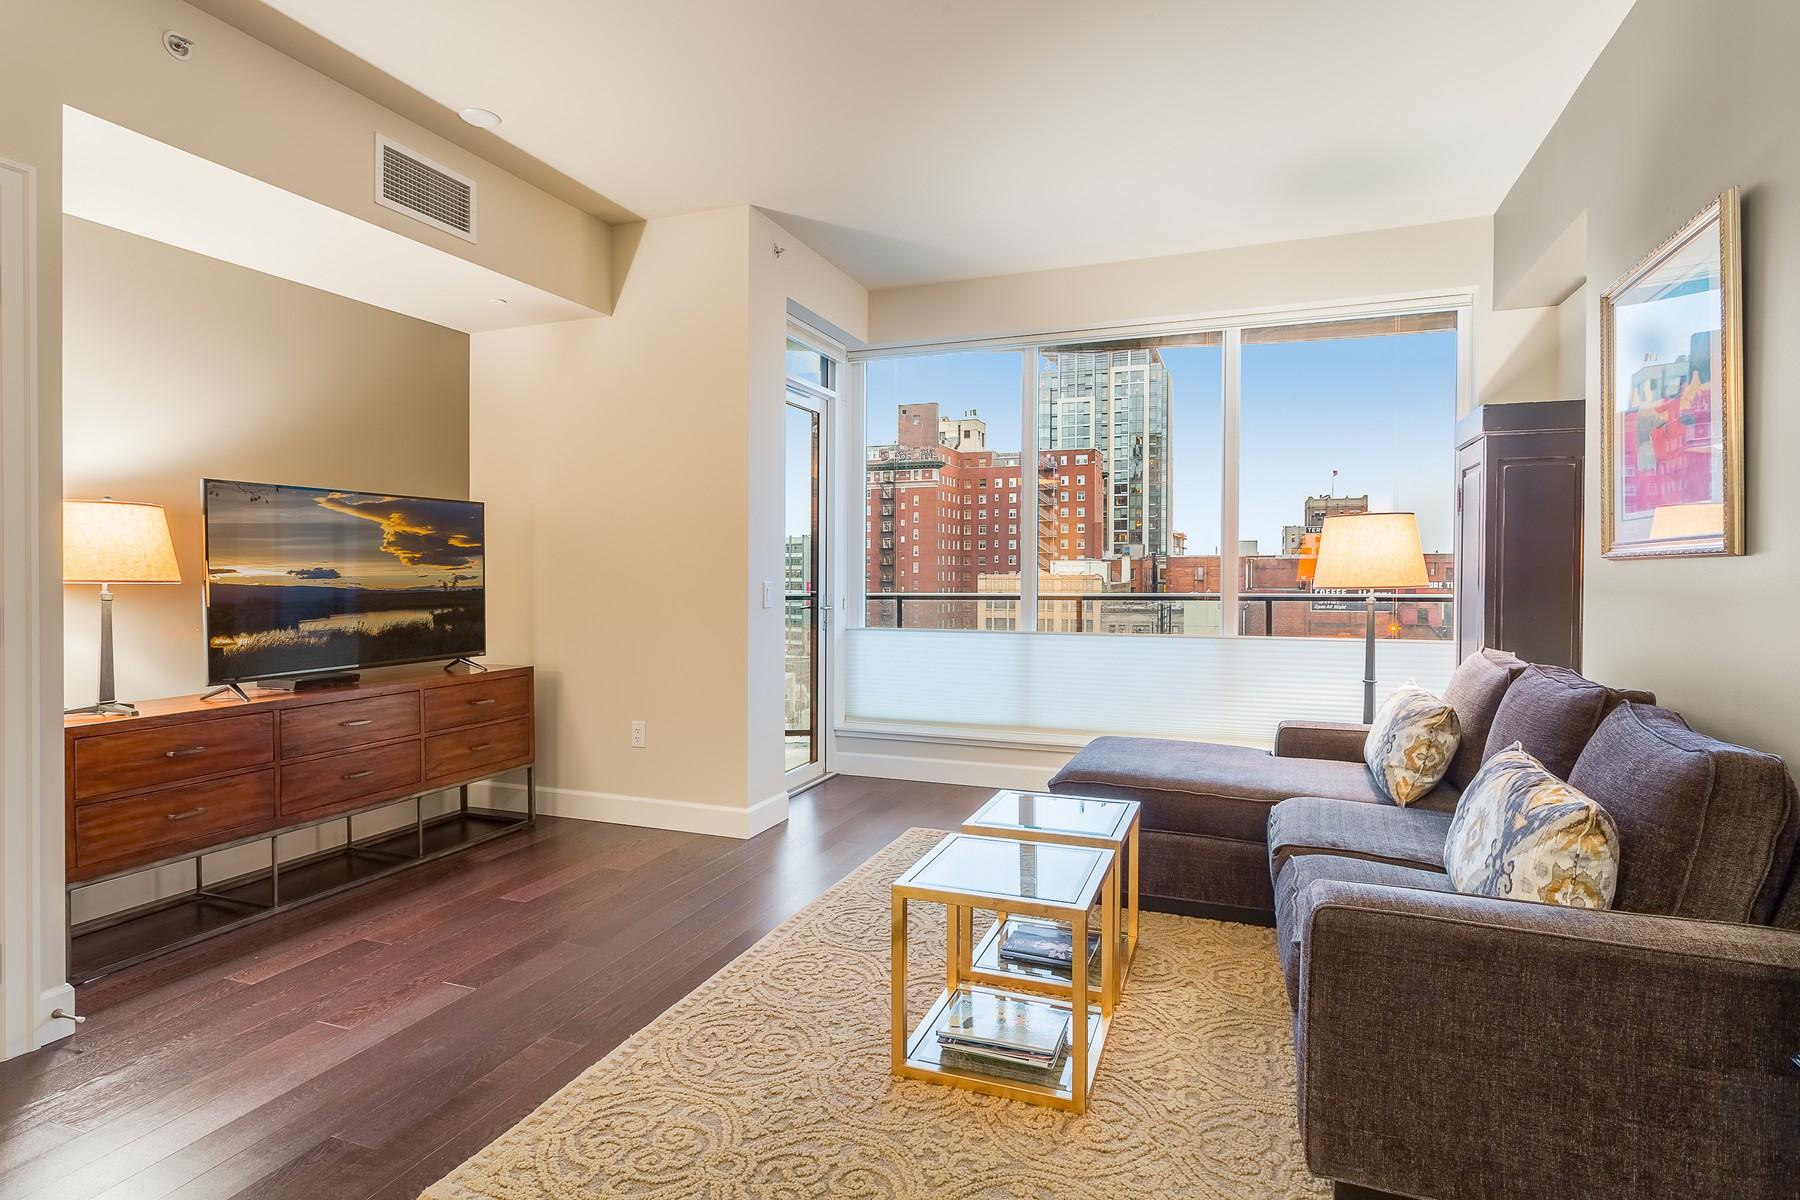 Condominium for Sale at Swanky Escala Condominium 1920 4th Ave #904 Downtown, Seattle, Washington, 98101 United States